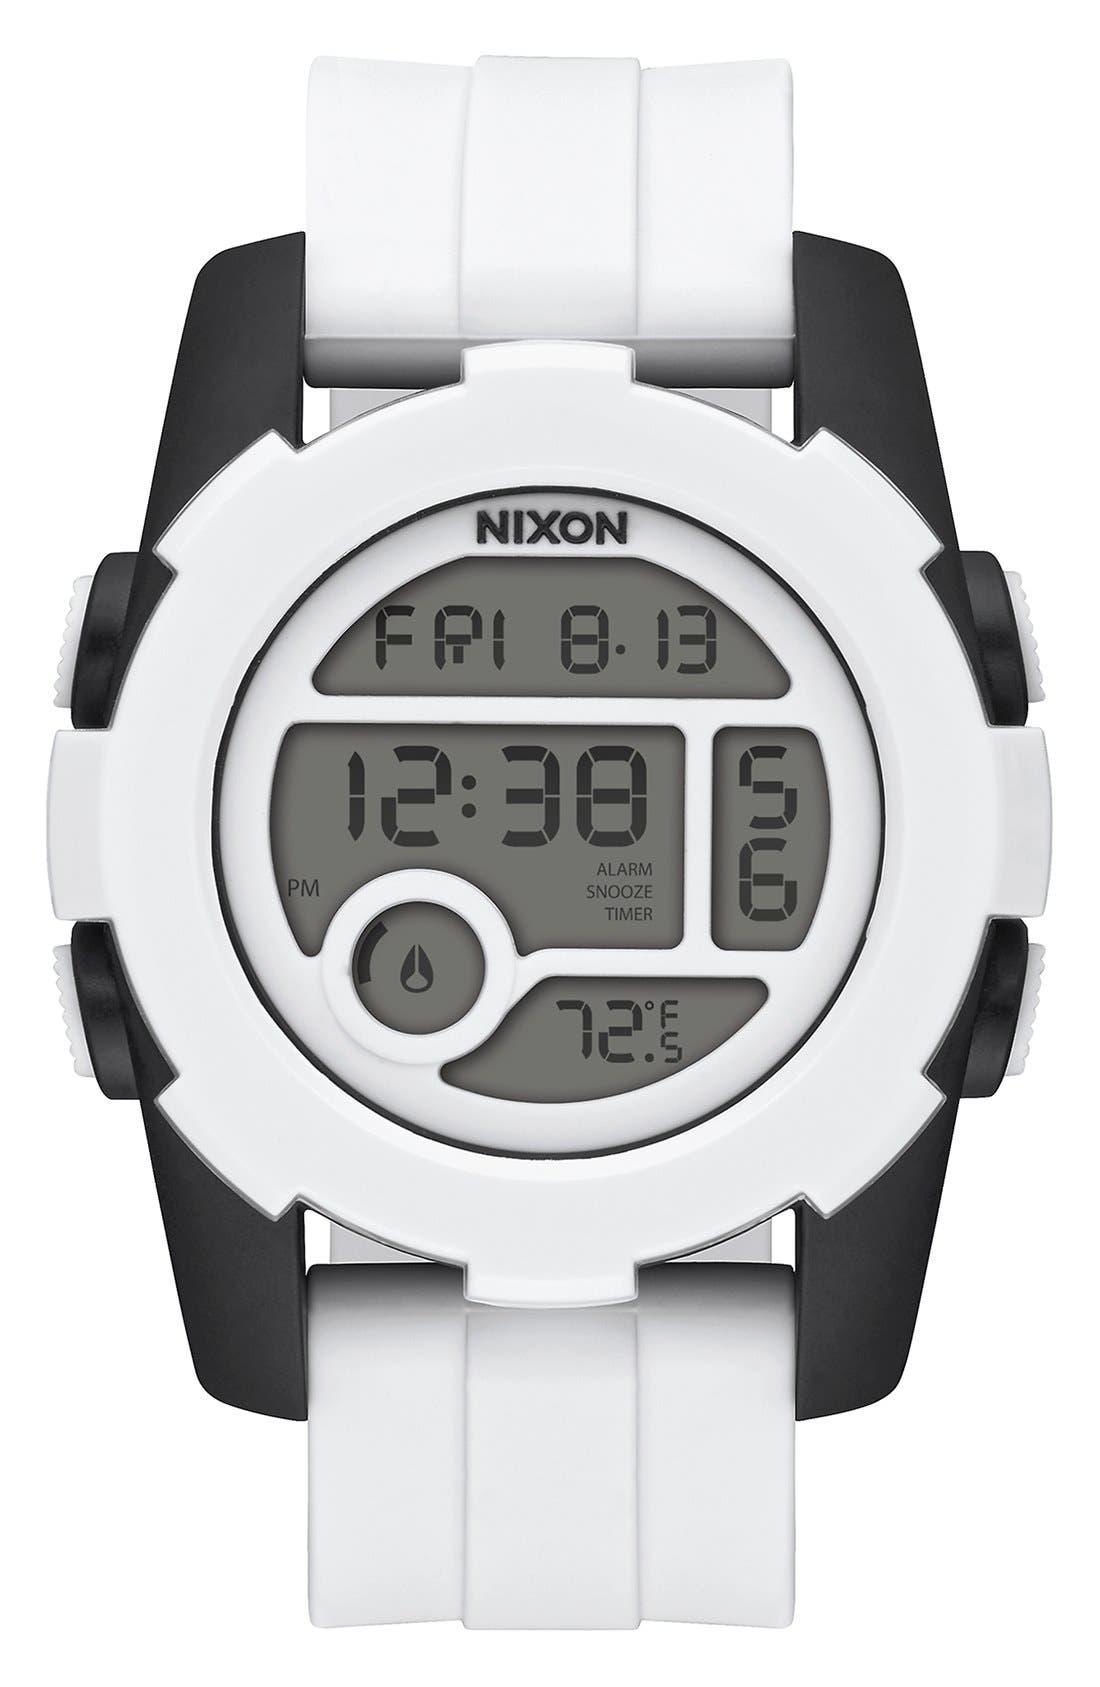 Main Image - Nixon 'Star Wars - The Unit Stormtrooper' Digital Watch, 40mm